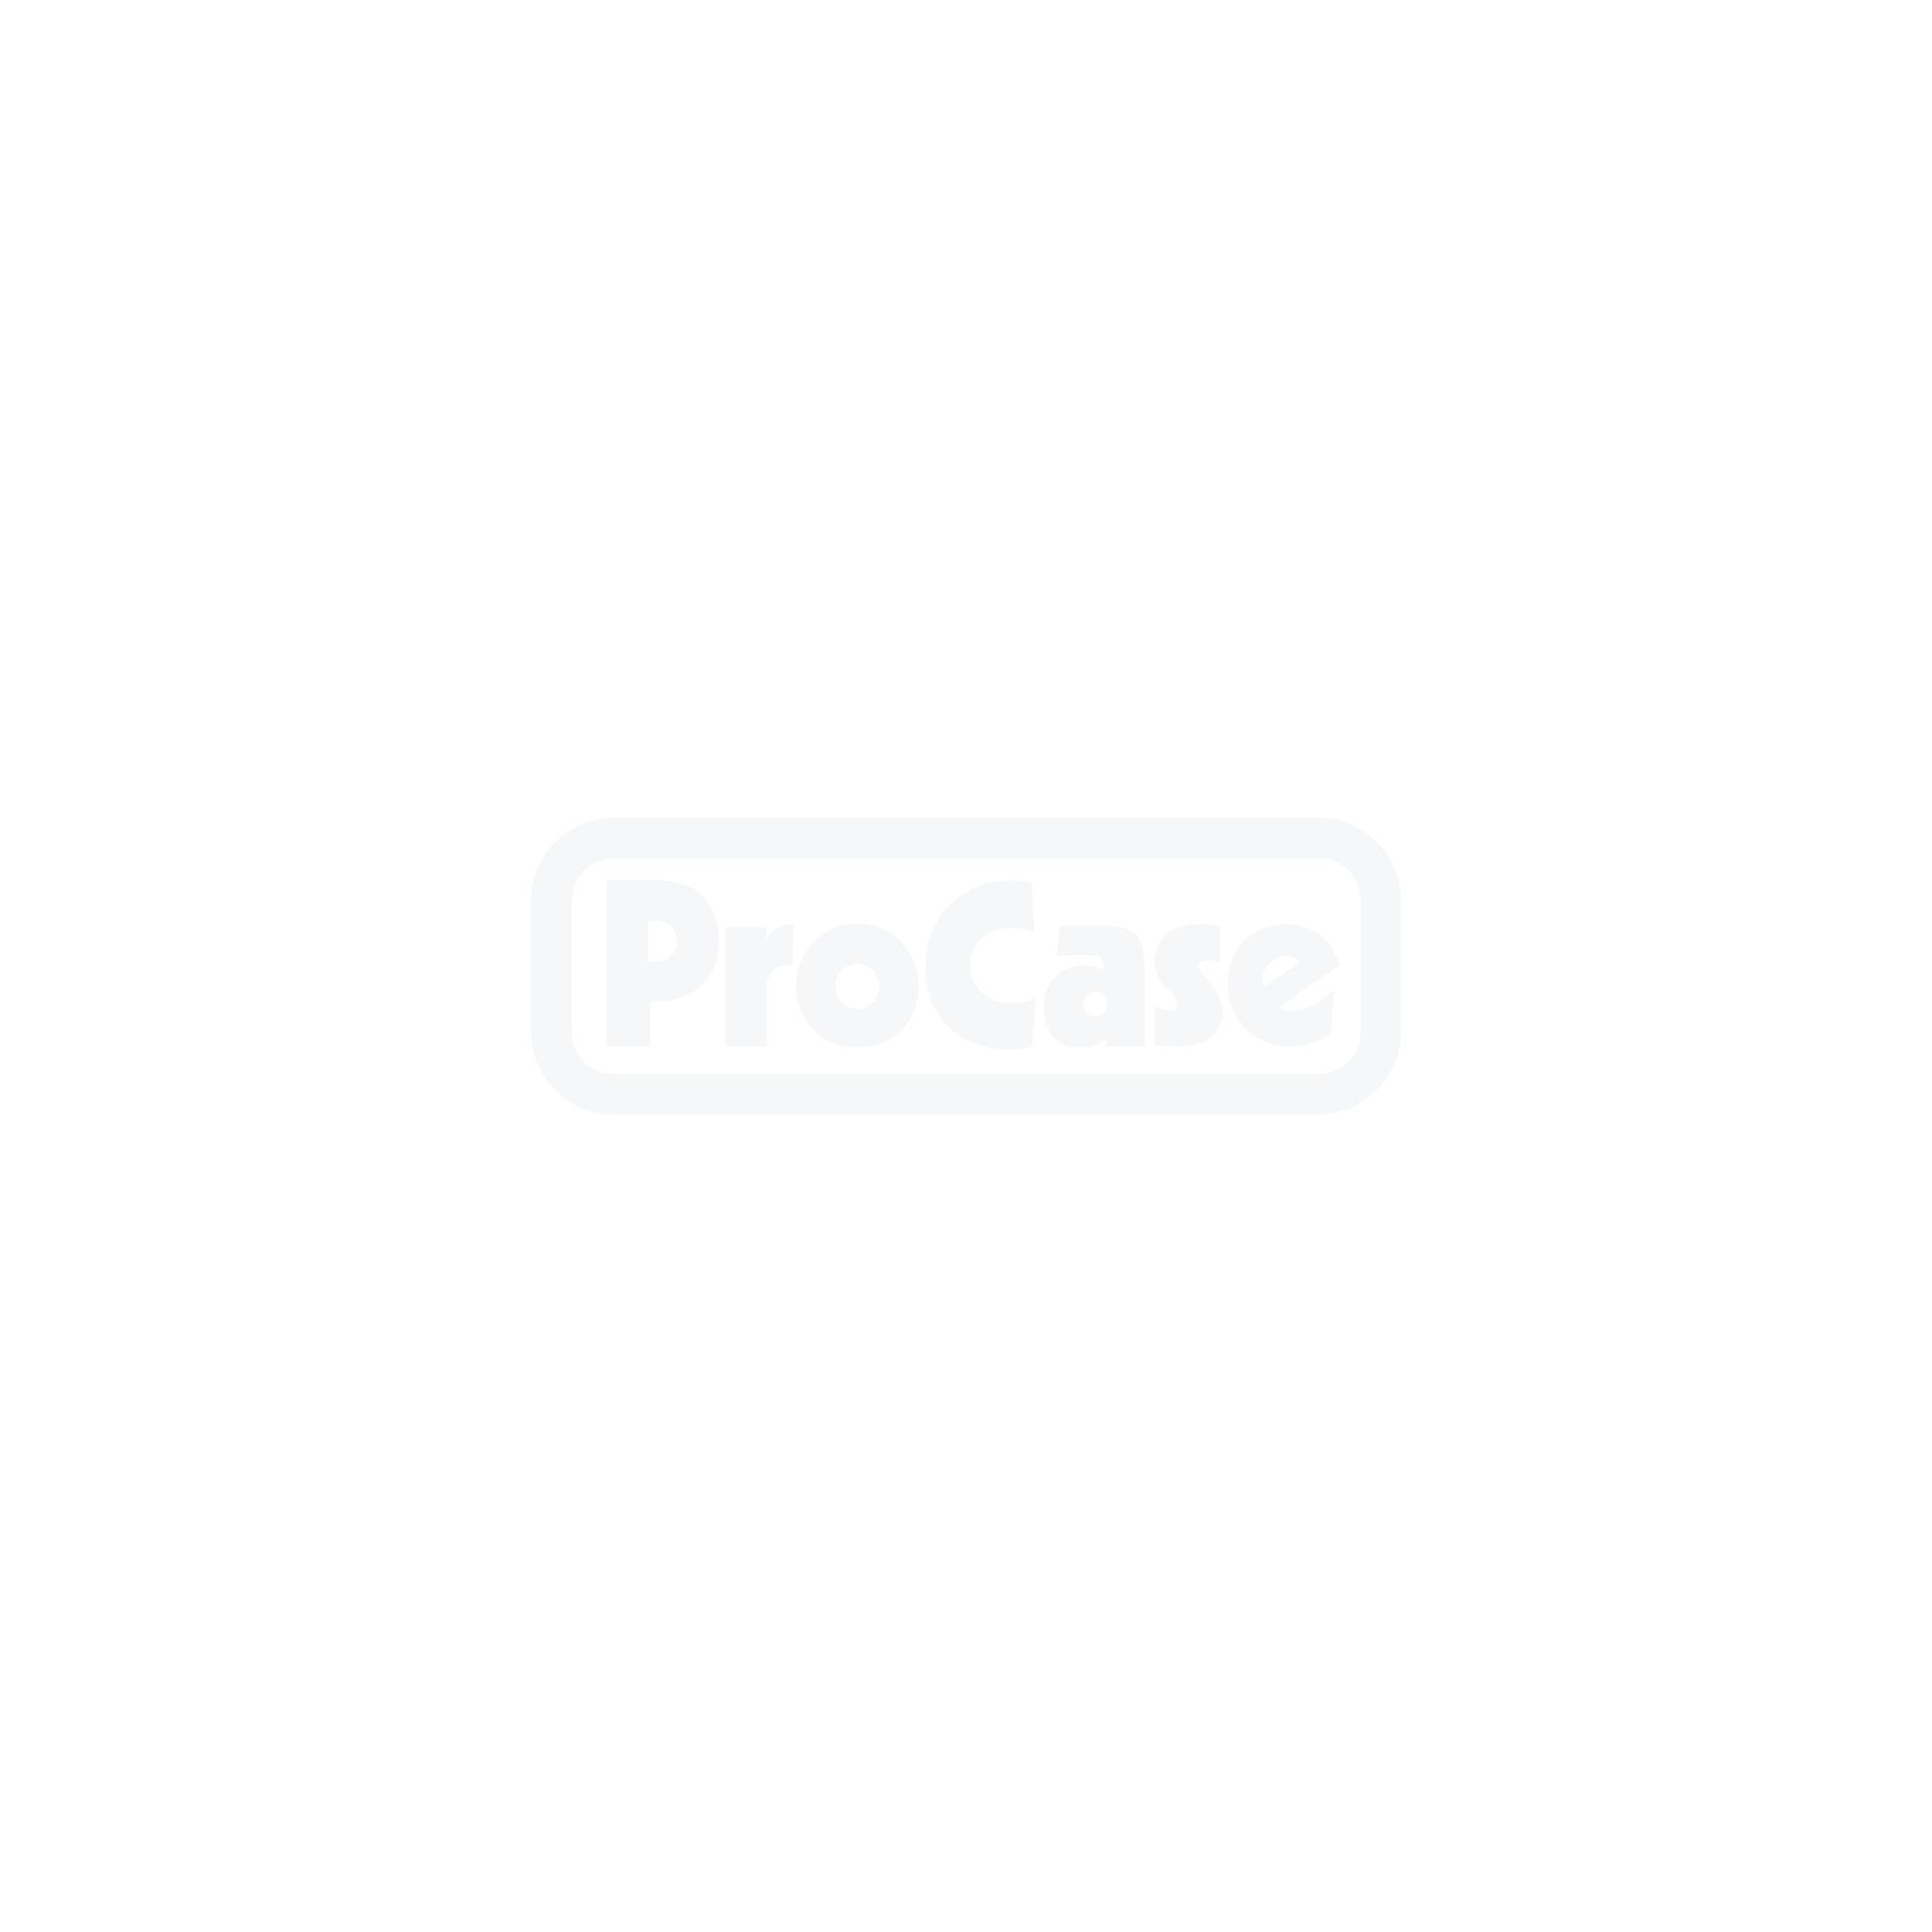 Flightcase Truhe für 1 St. Barco Lampenblock HDX LMP 2,5KW